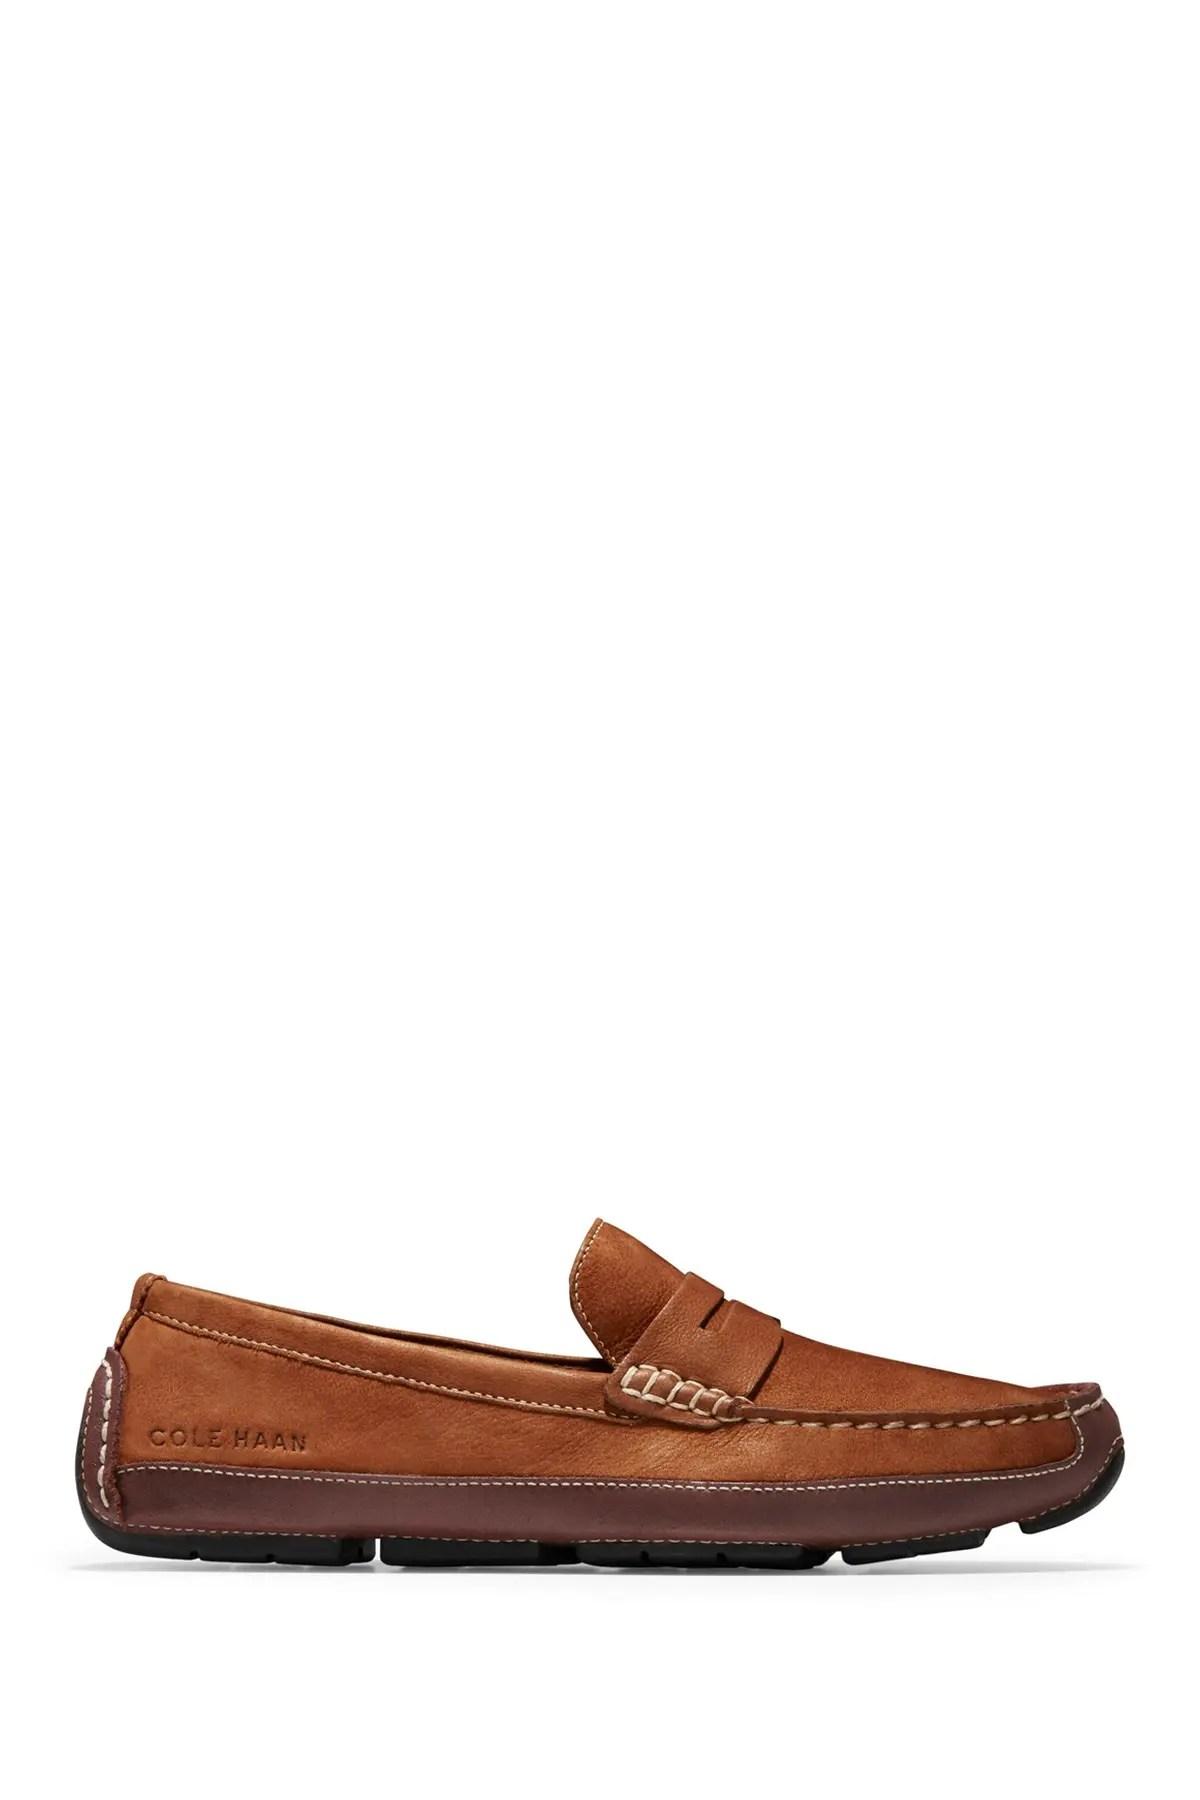 comfort loafers slip ons for men